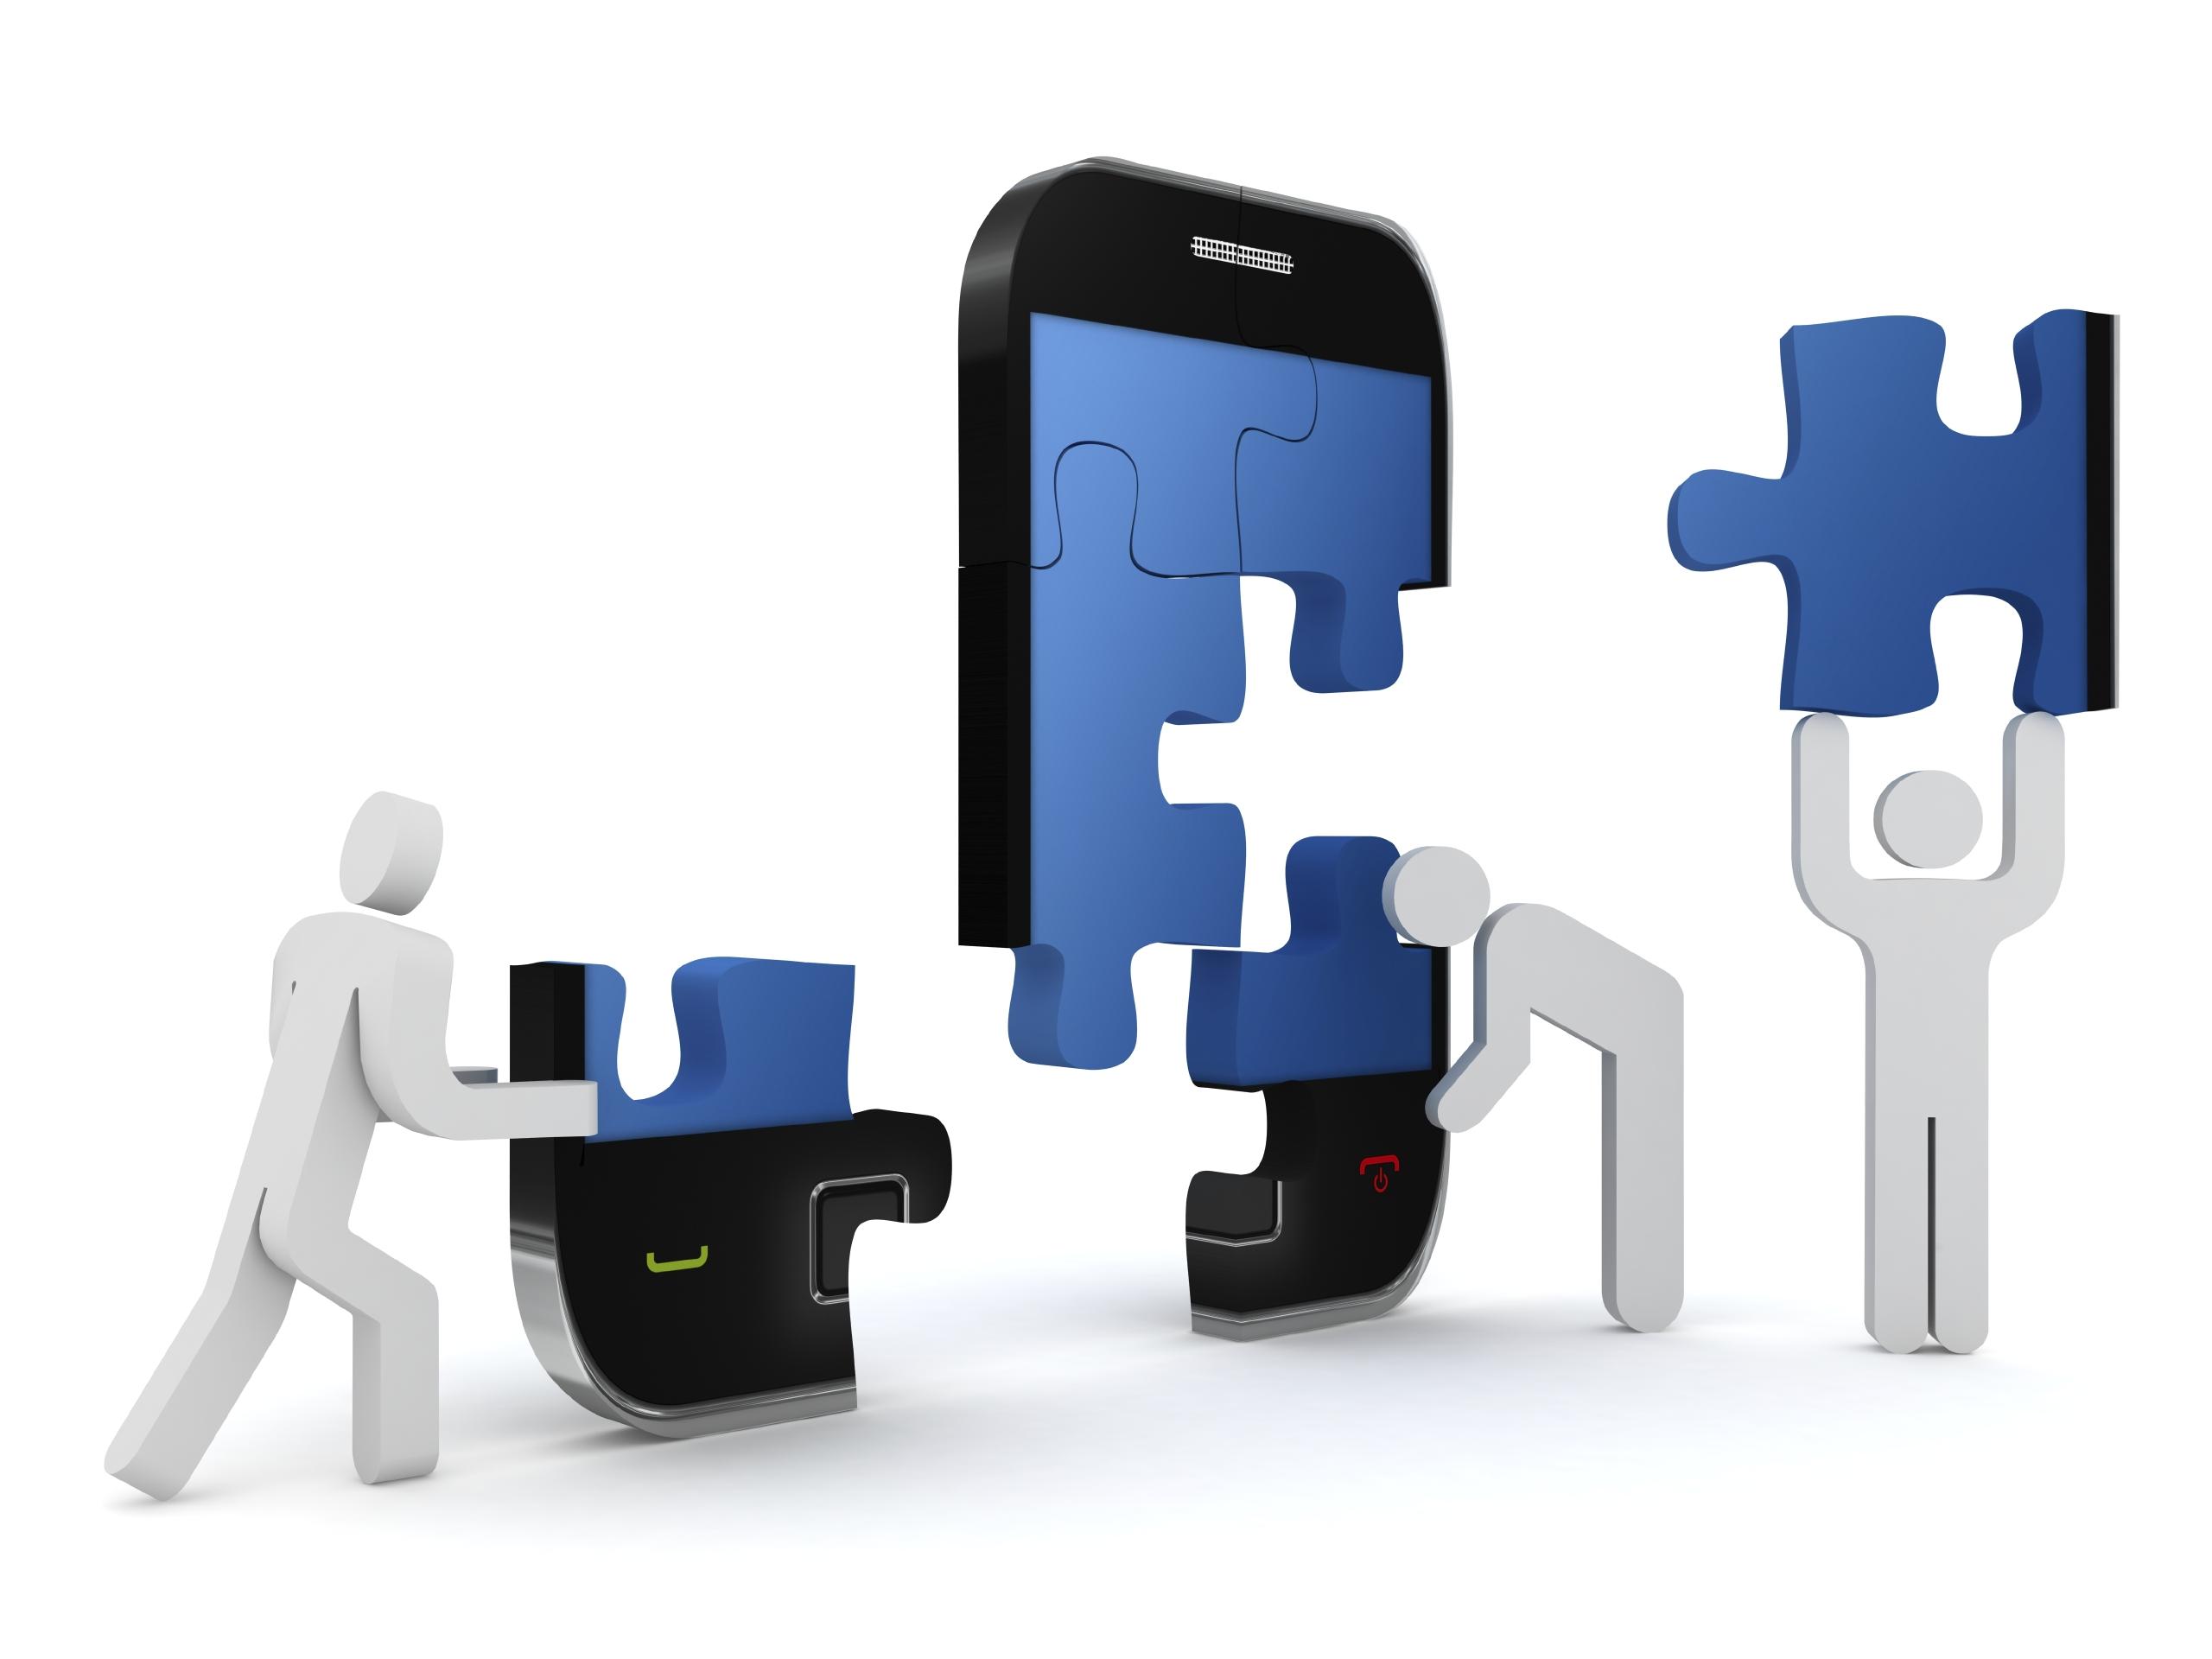 WorkToday - Lite - The New Generation Task Management App